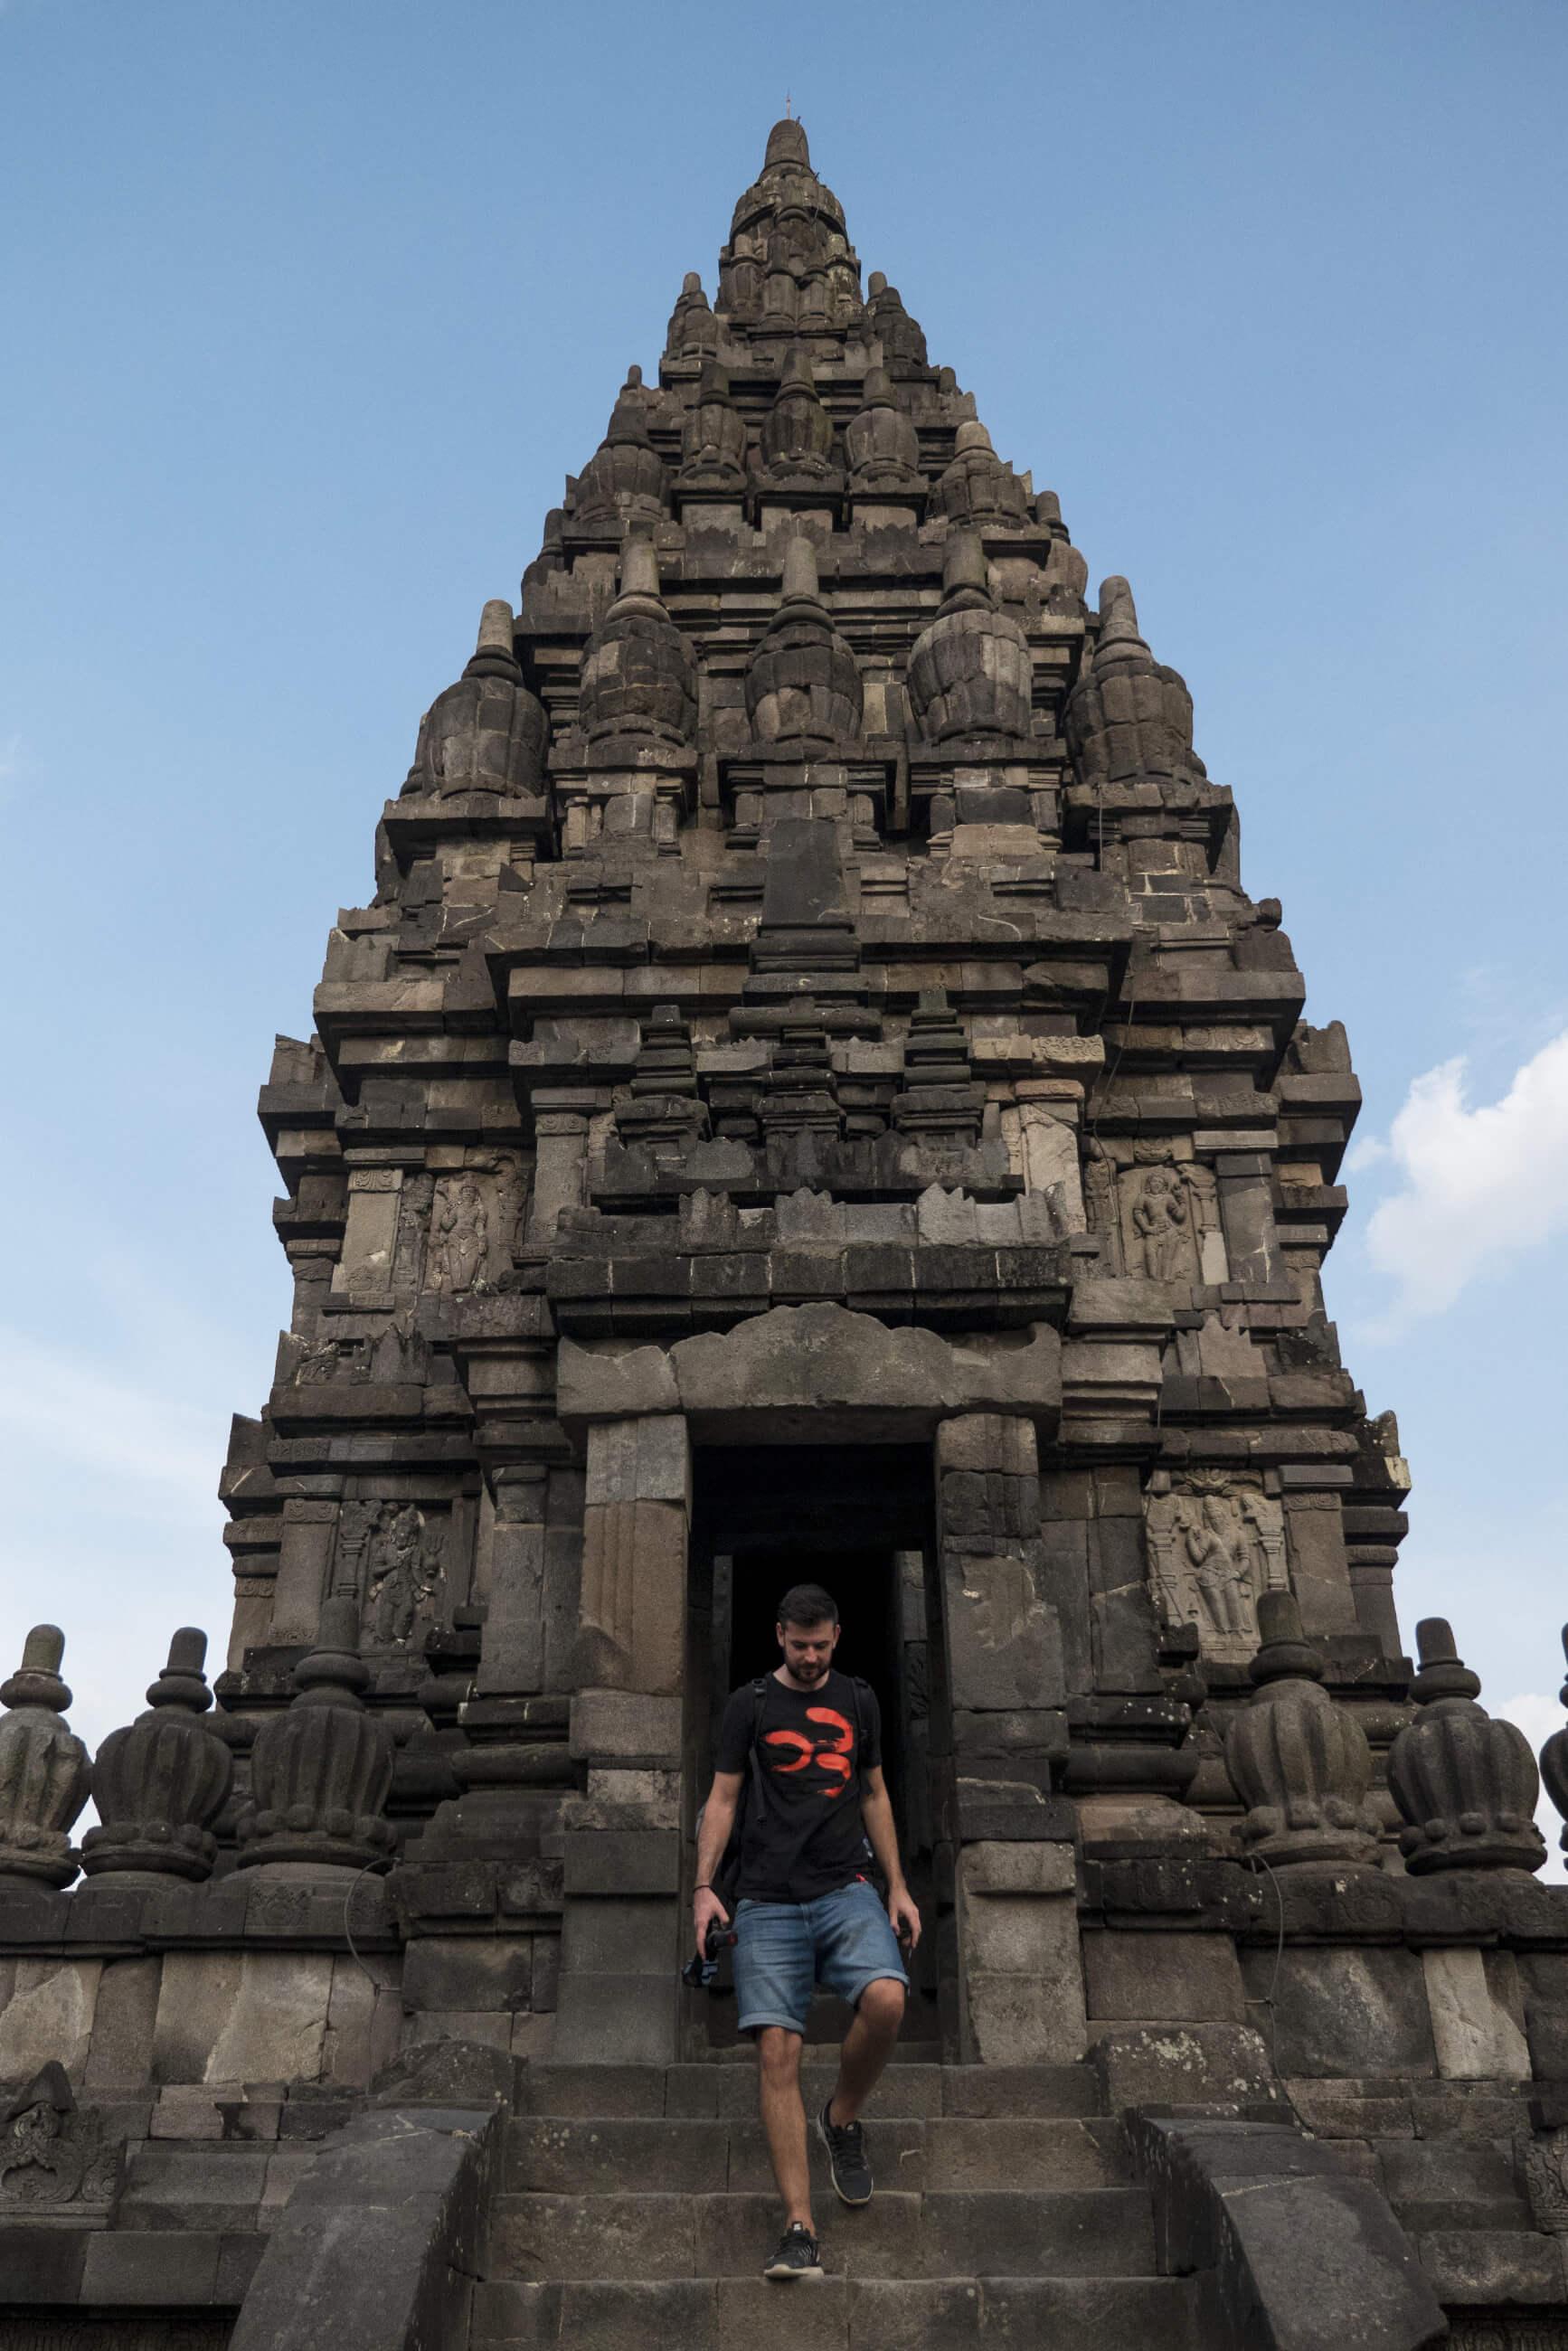 https://bubo.sk/uploads/galleries/7542/martin_simko_indonezia_java_prambanan02.jpg